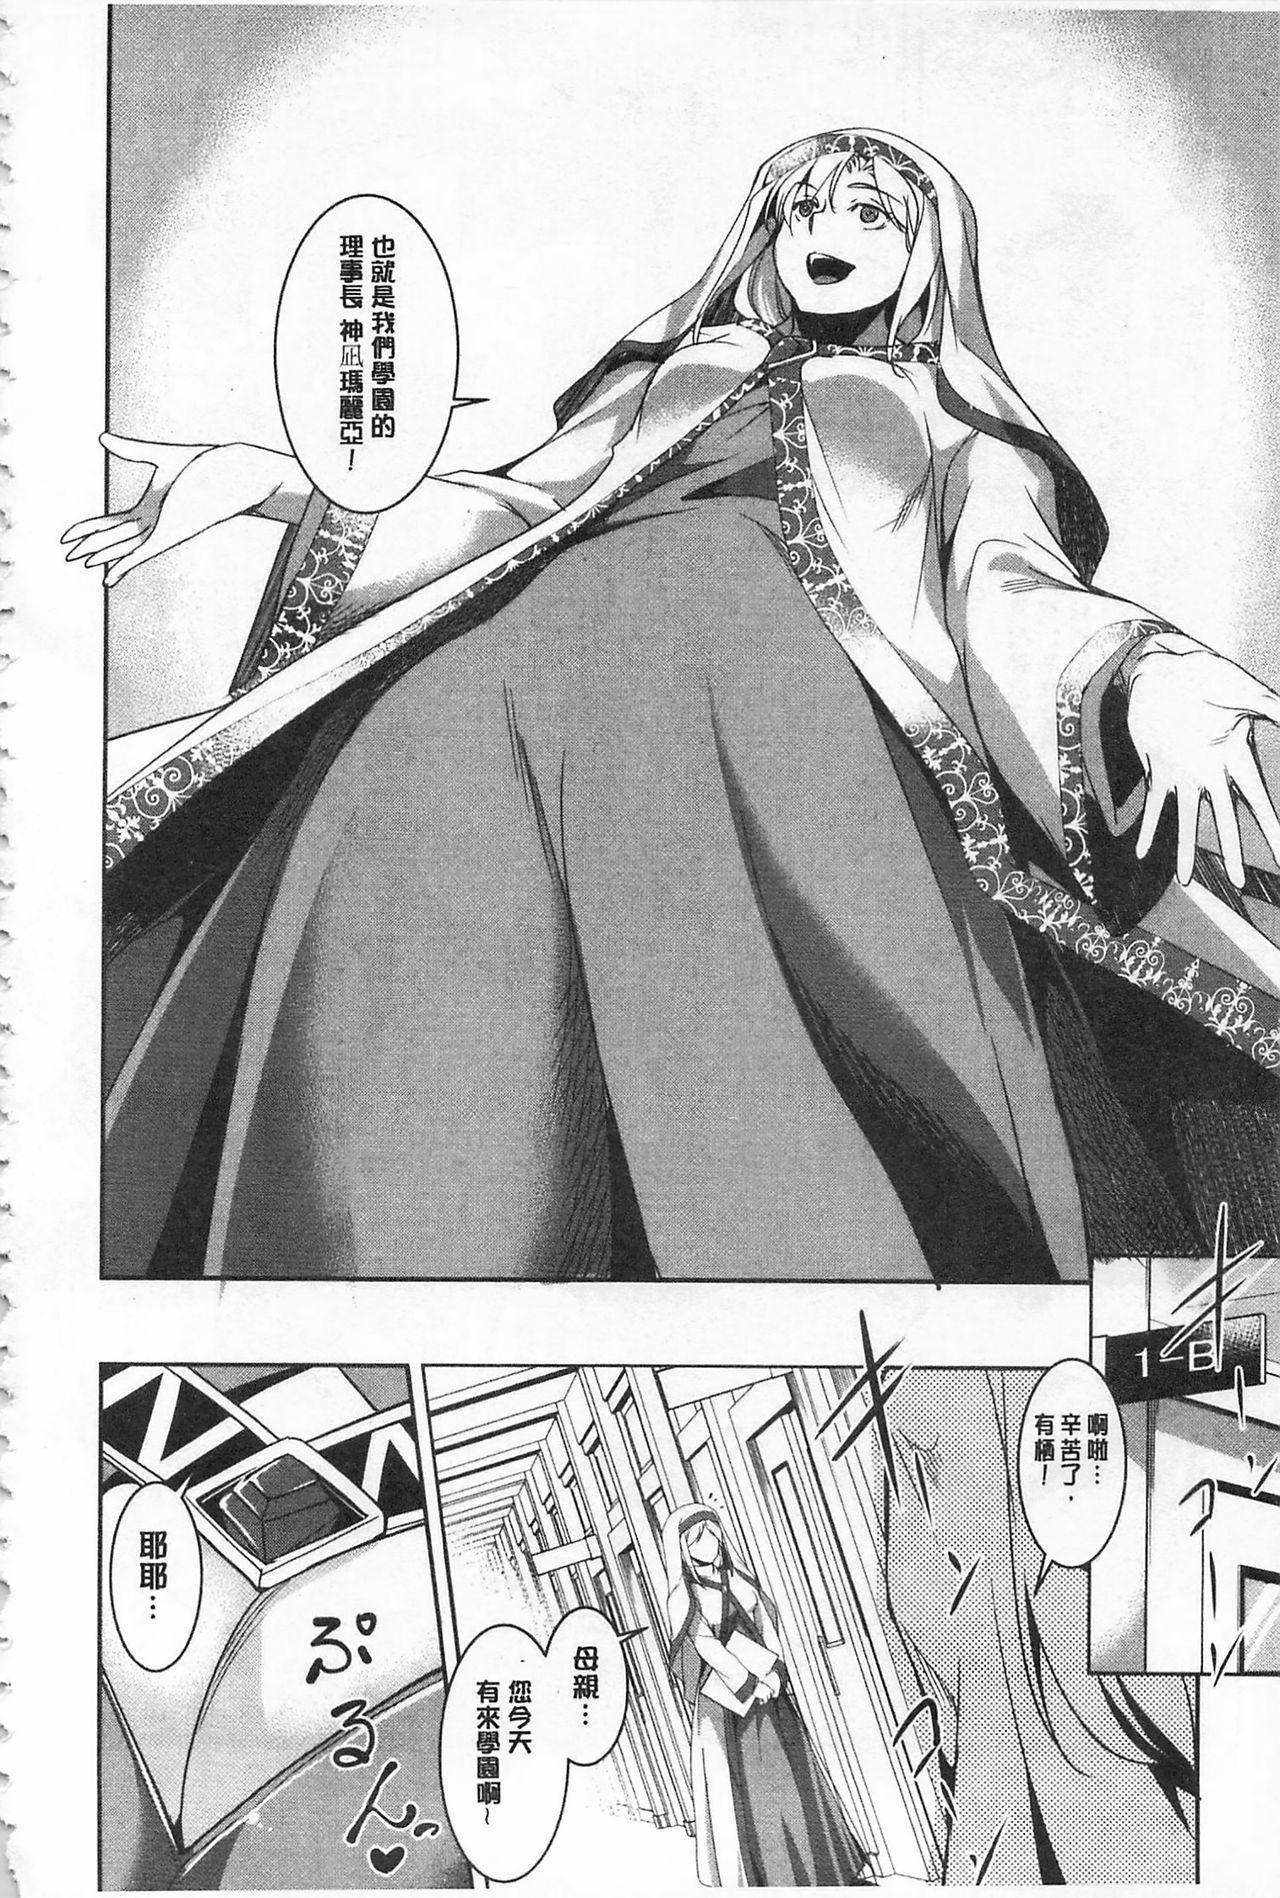 [Amano Kazumi] Seida Inyou -Seijo no Katachi Shita Intou- | 聖墮陰陽 -聖女的容貌與淫蕩- [Chinese] 15